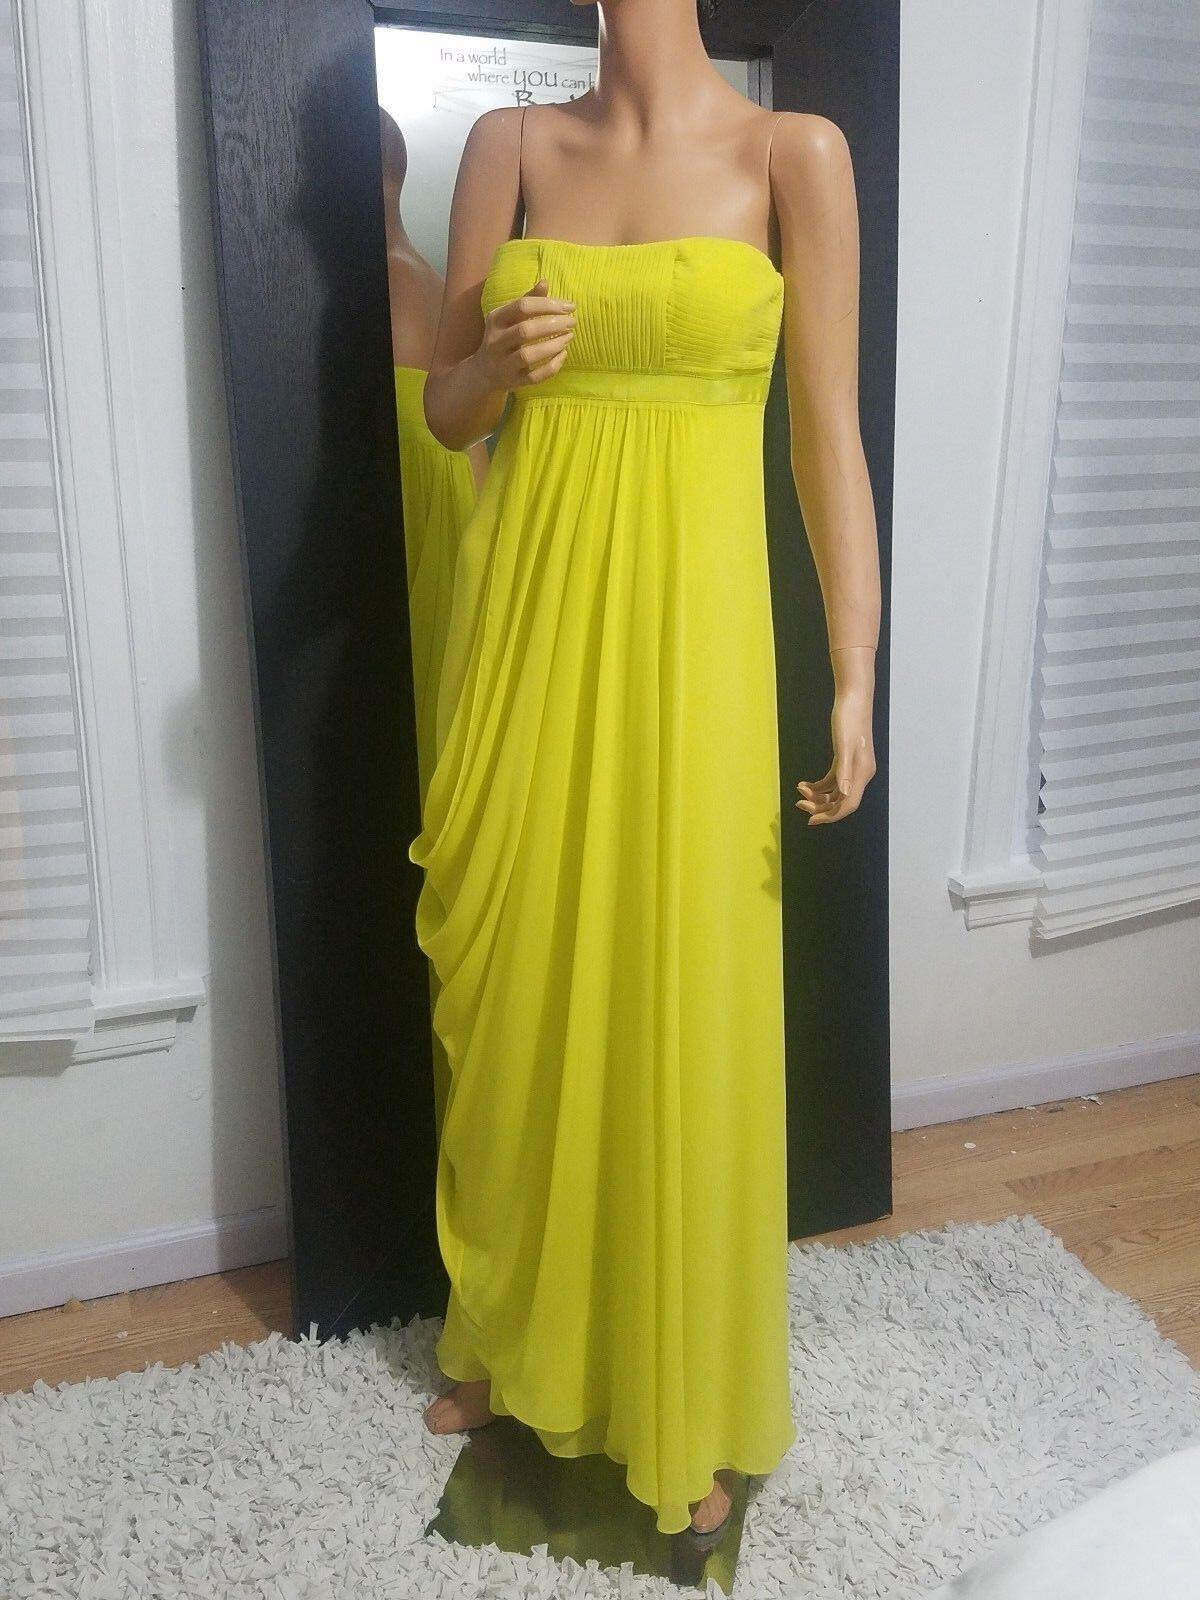 Bcbg dress lemon grass 6